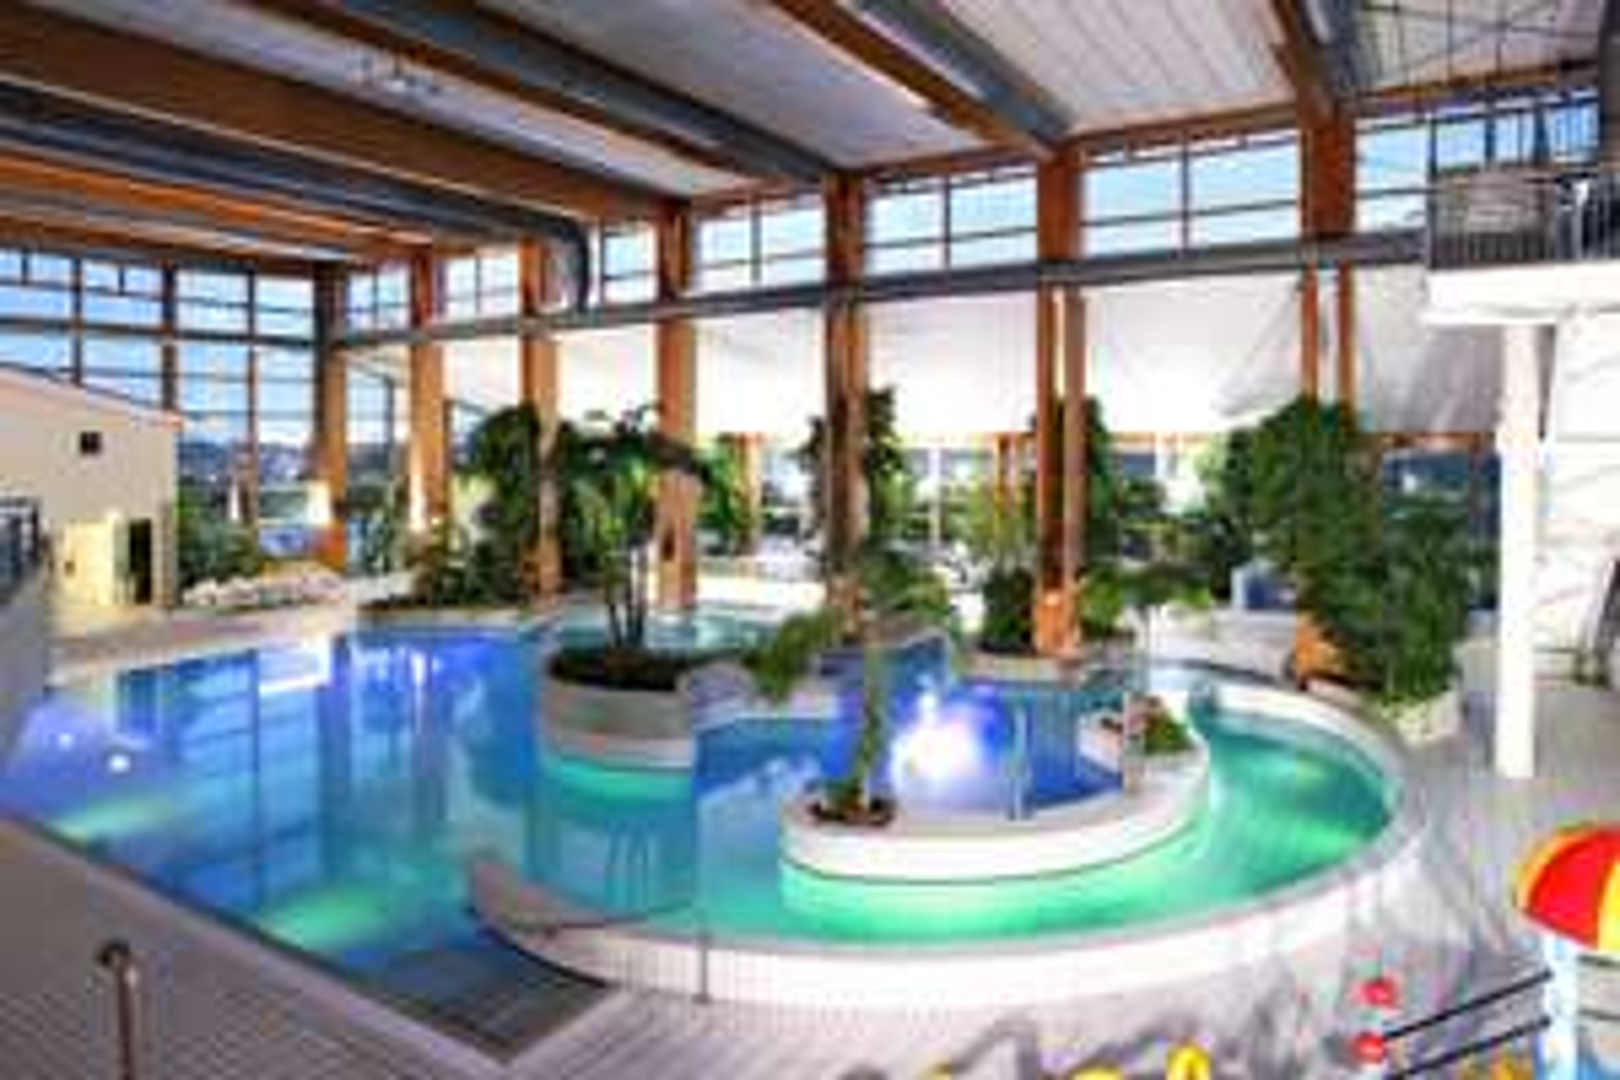 3 Tage im 4* Precise Resort Rügen inkl. HP und 3500 m² Therme ab 99€ pro Person